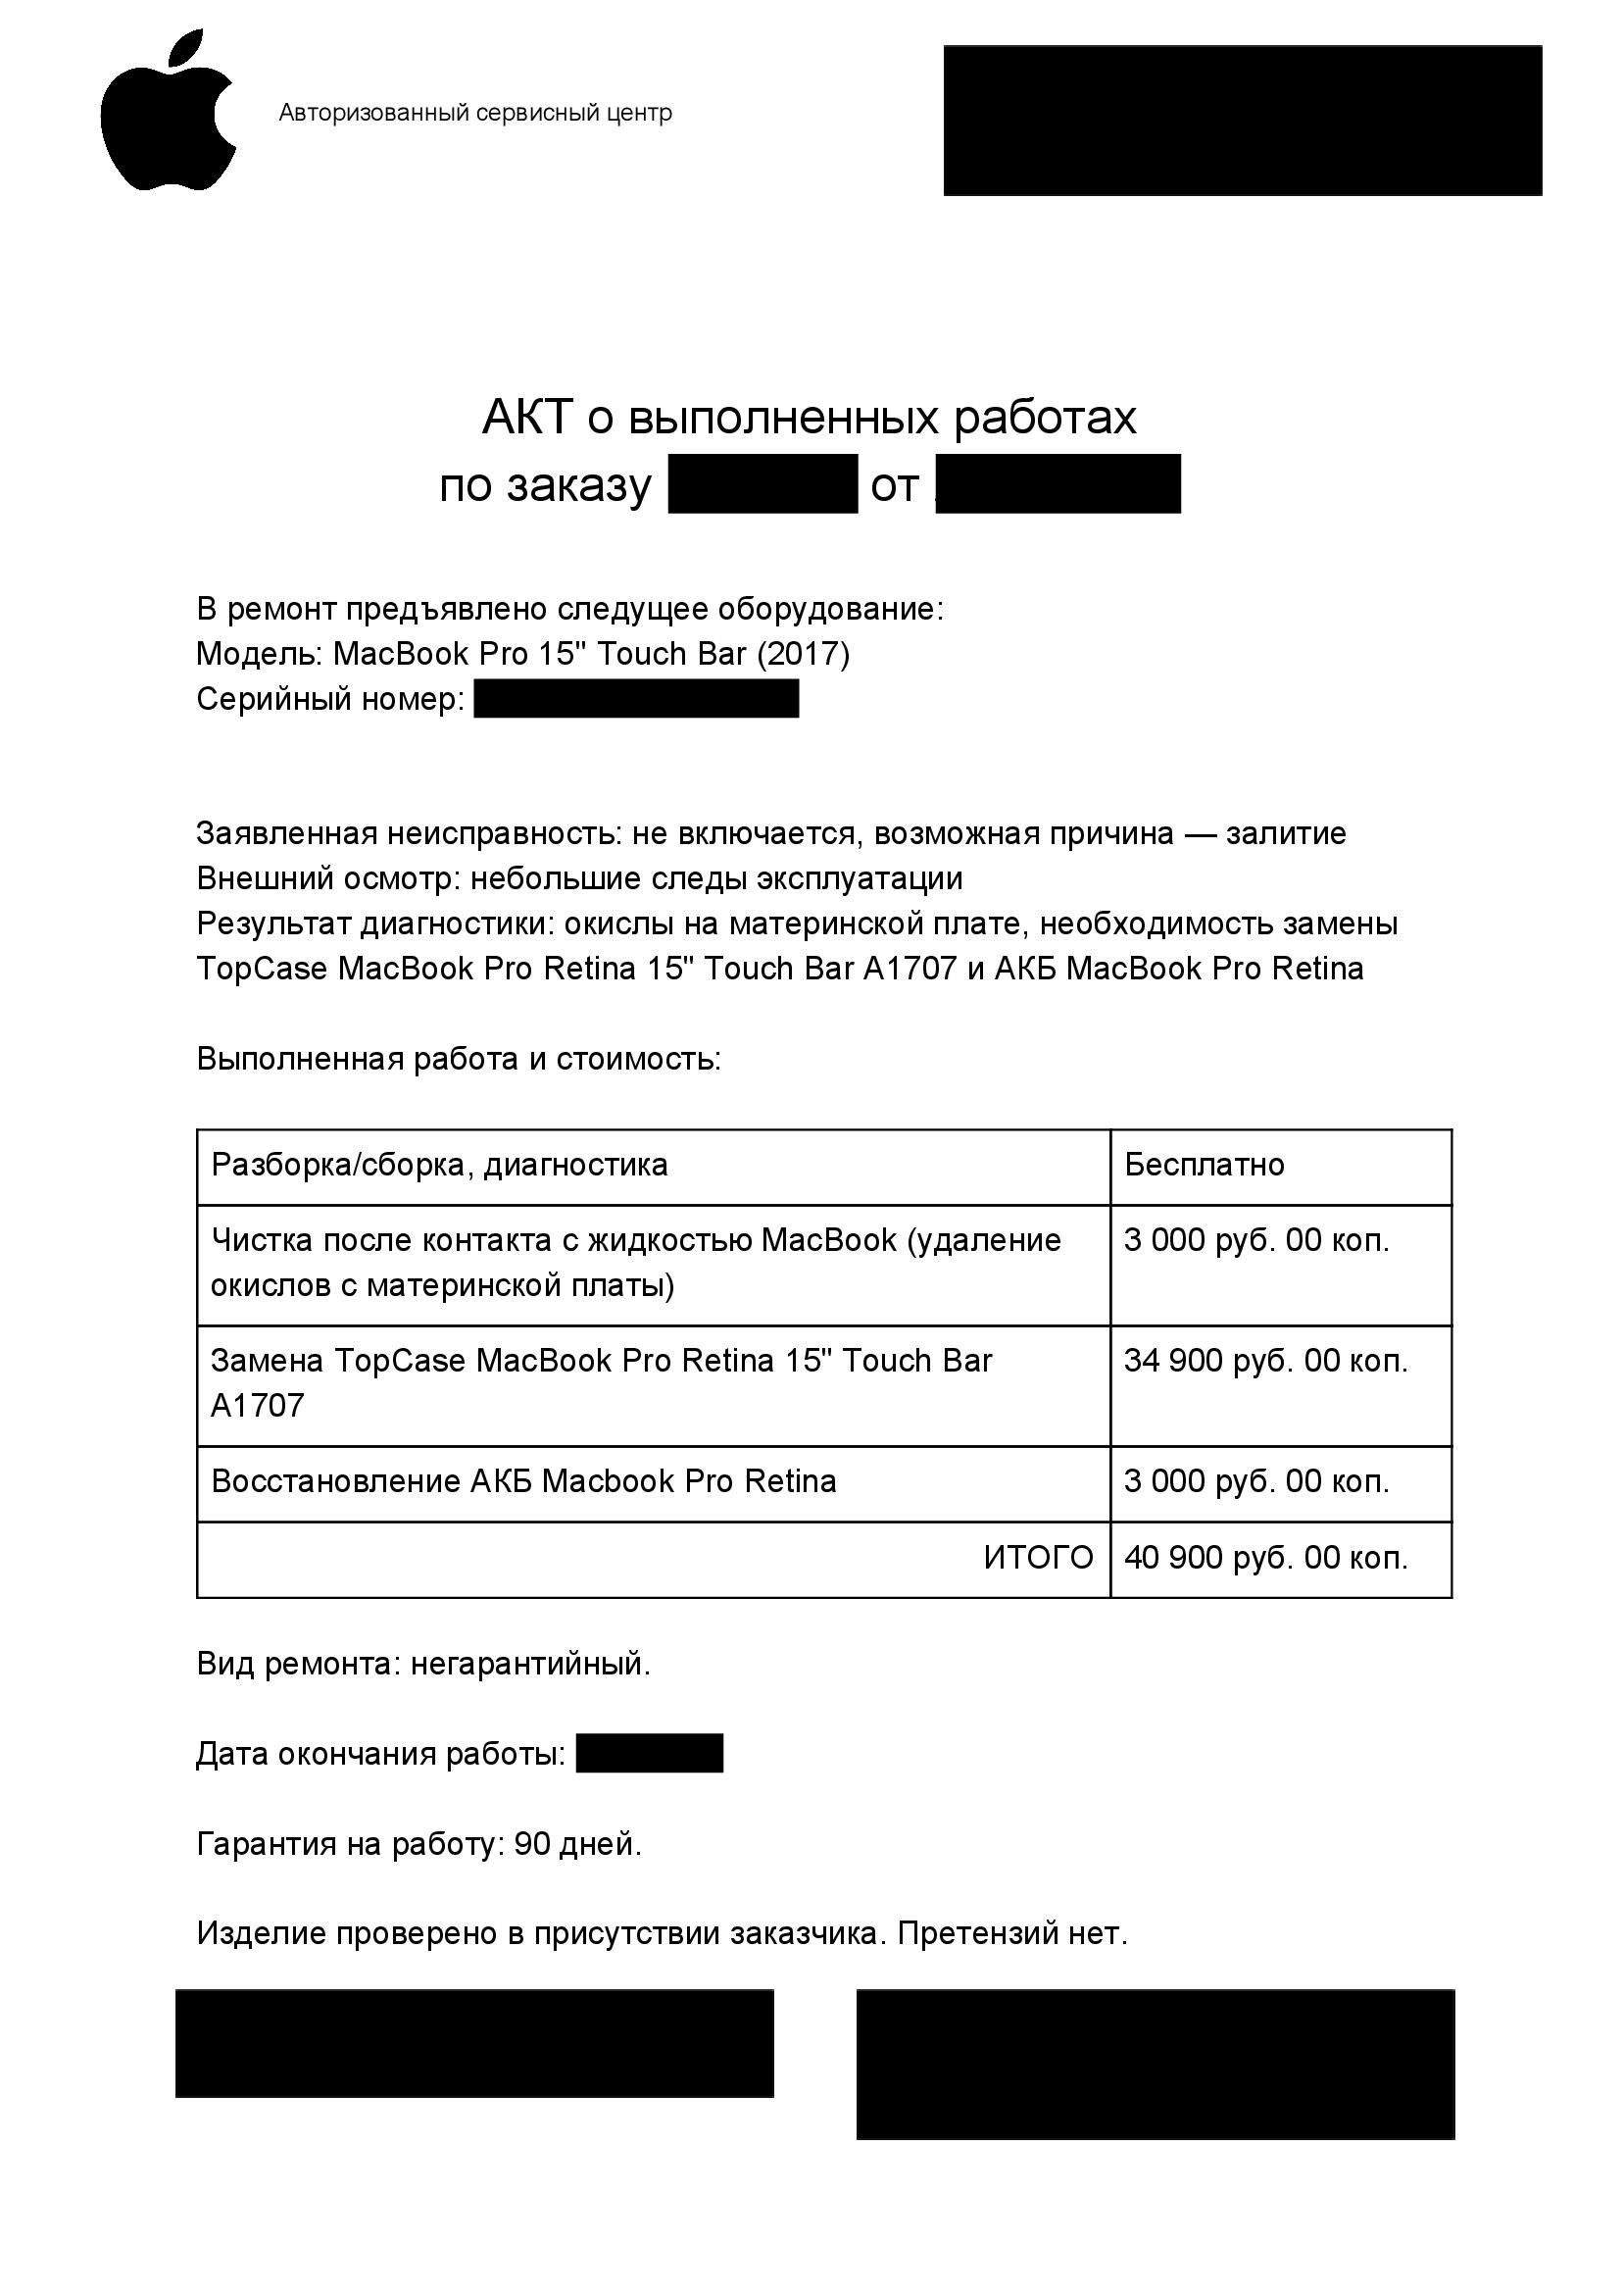 Пример акта о ремонте Макбука